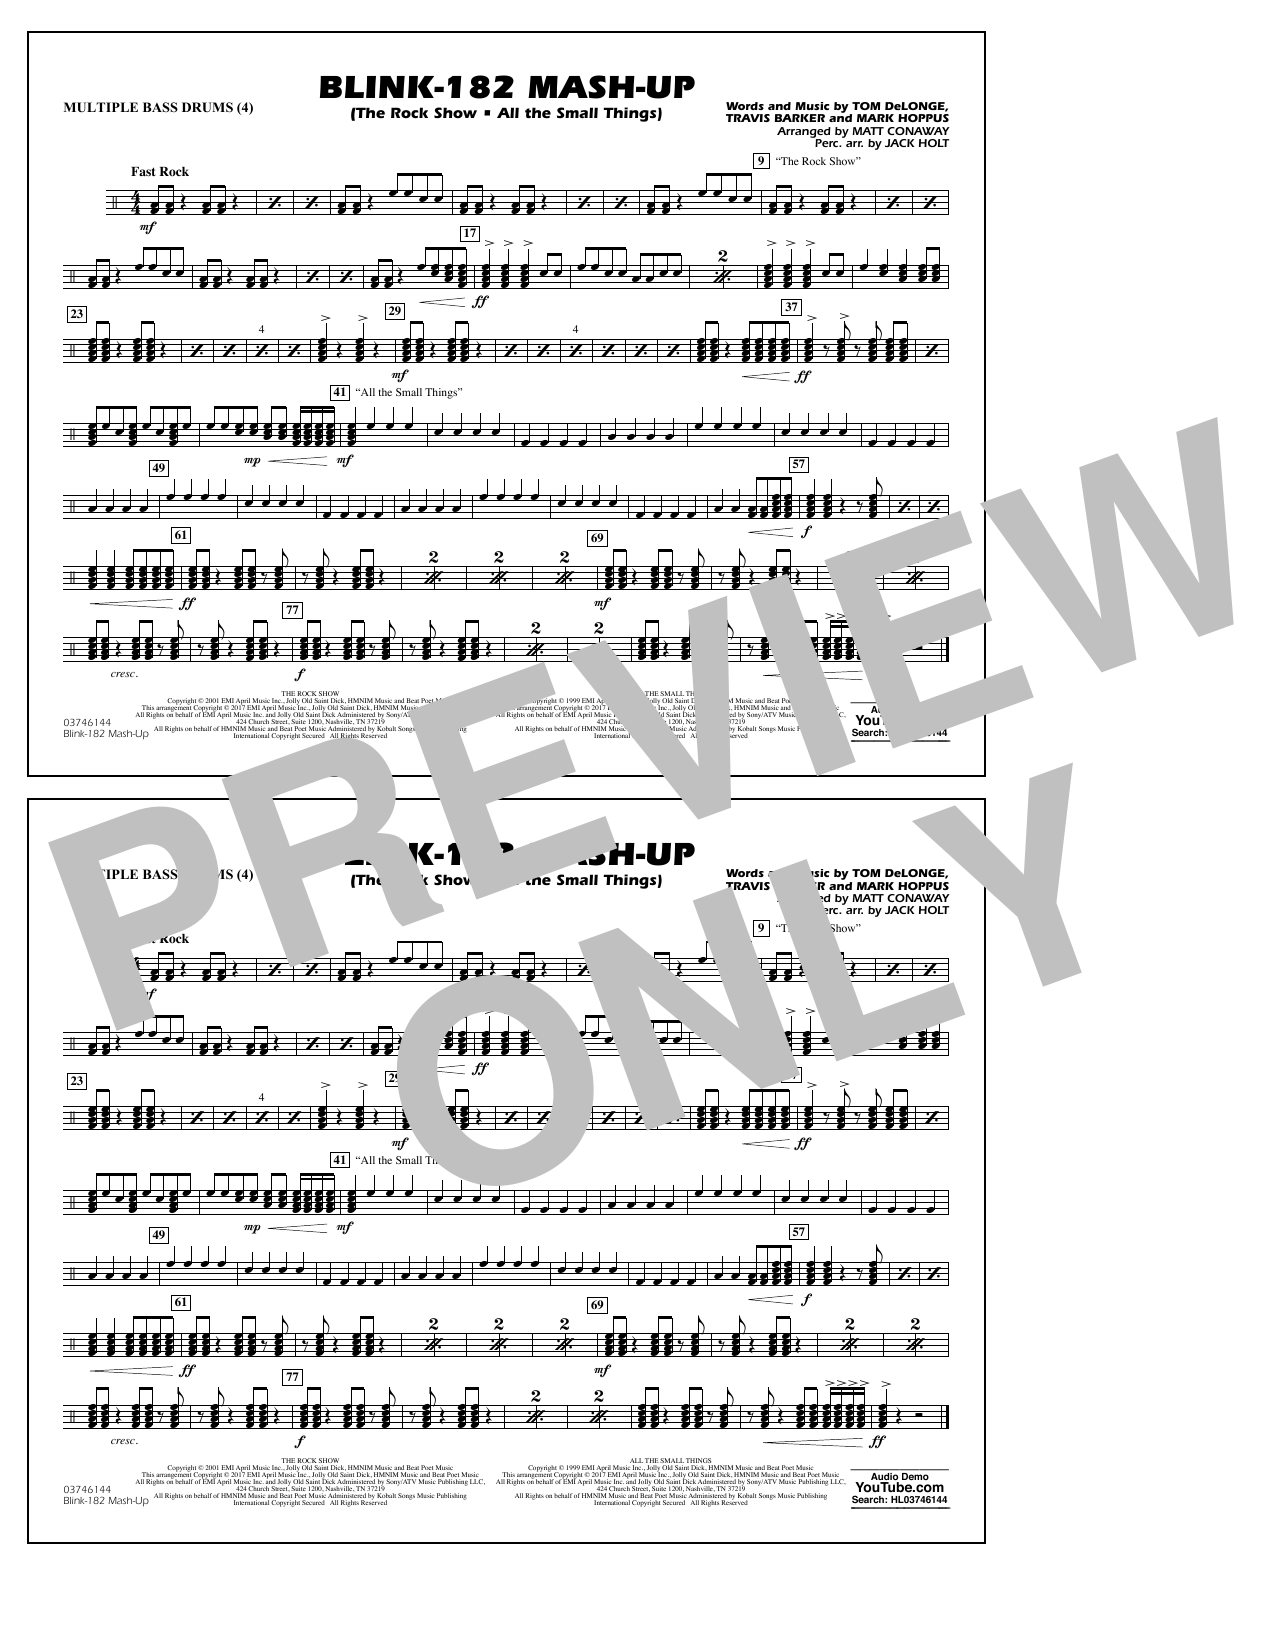 Blink-182 Mash-Up - Multiple Bass Drums Sheet Music